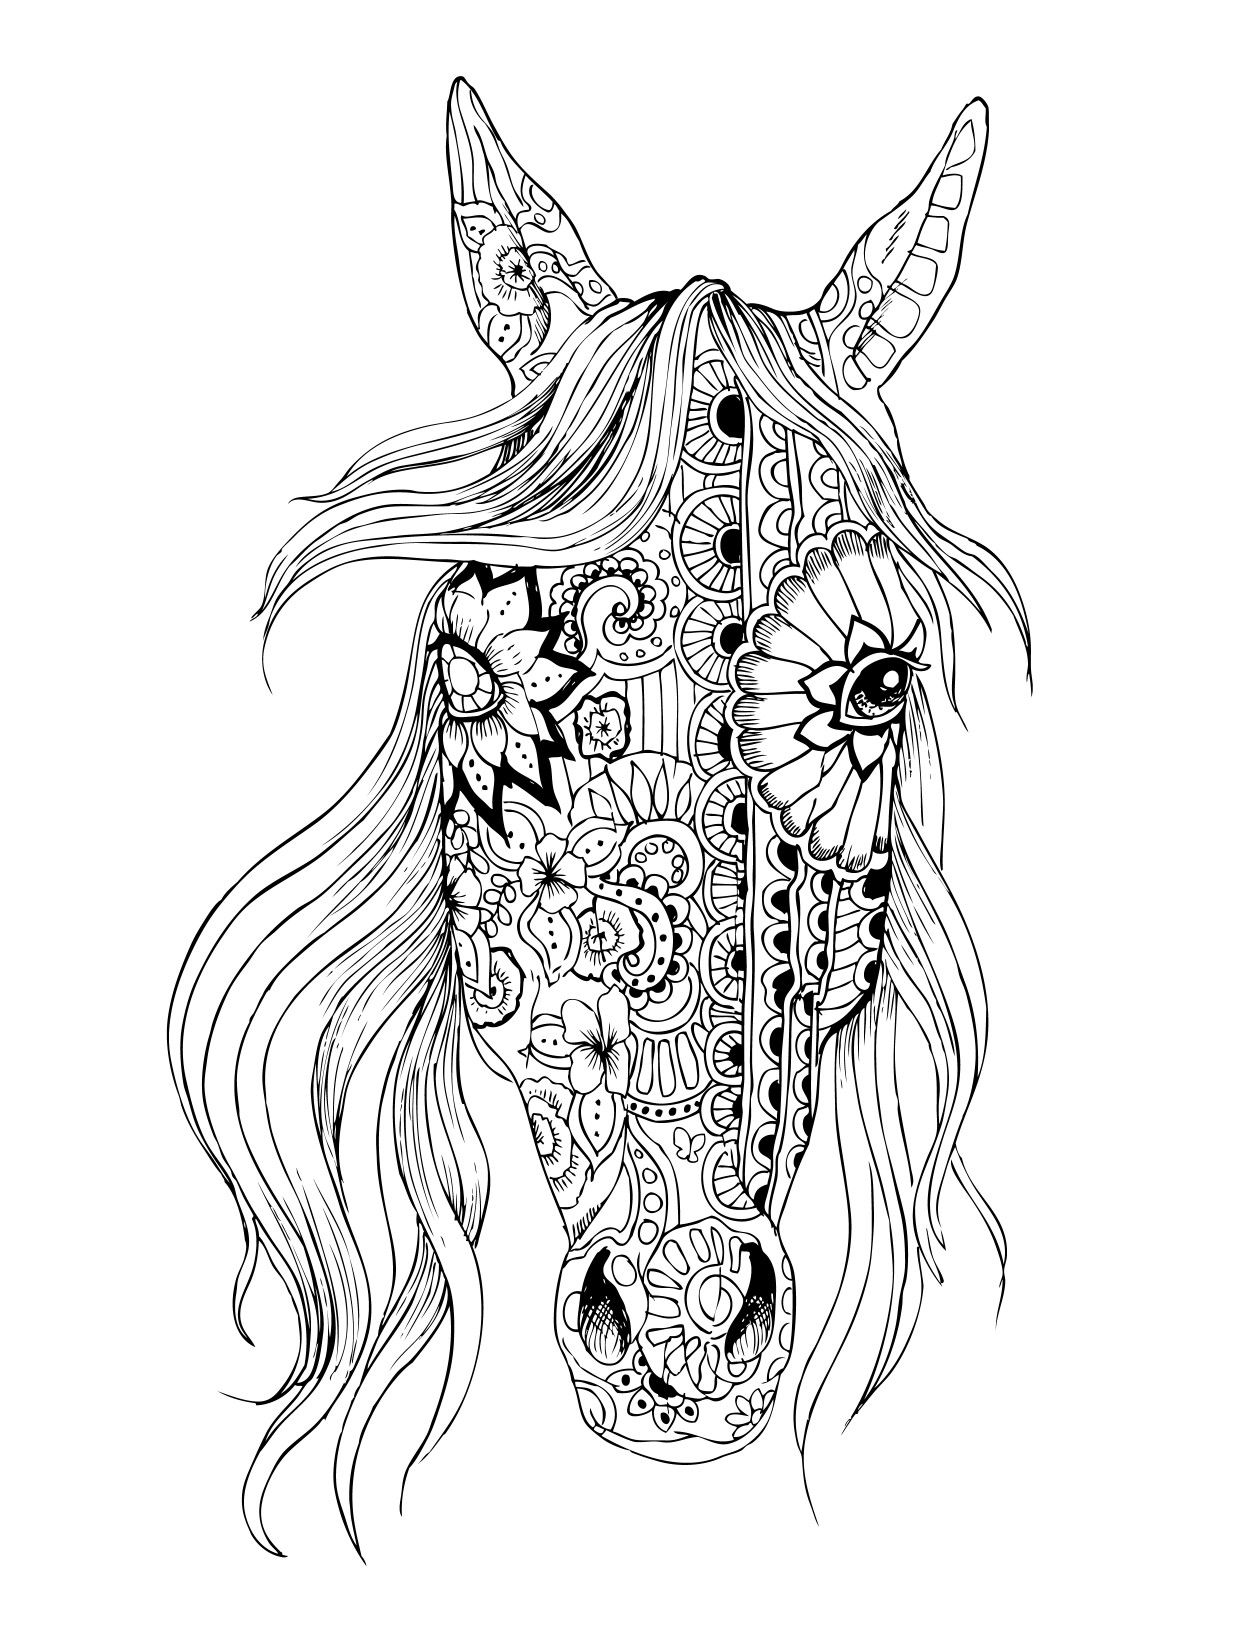 Paard Hoofd Zen Horse Coloring Pages Animal Coloring Pages Horse Coloring Books [ 1636 x 1253 Pixel ]